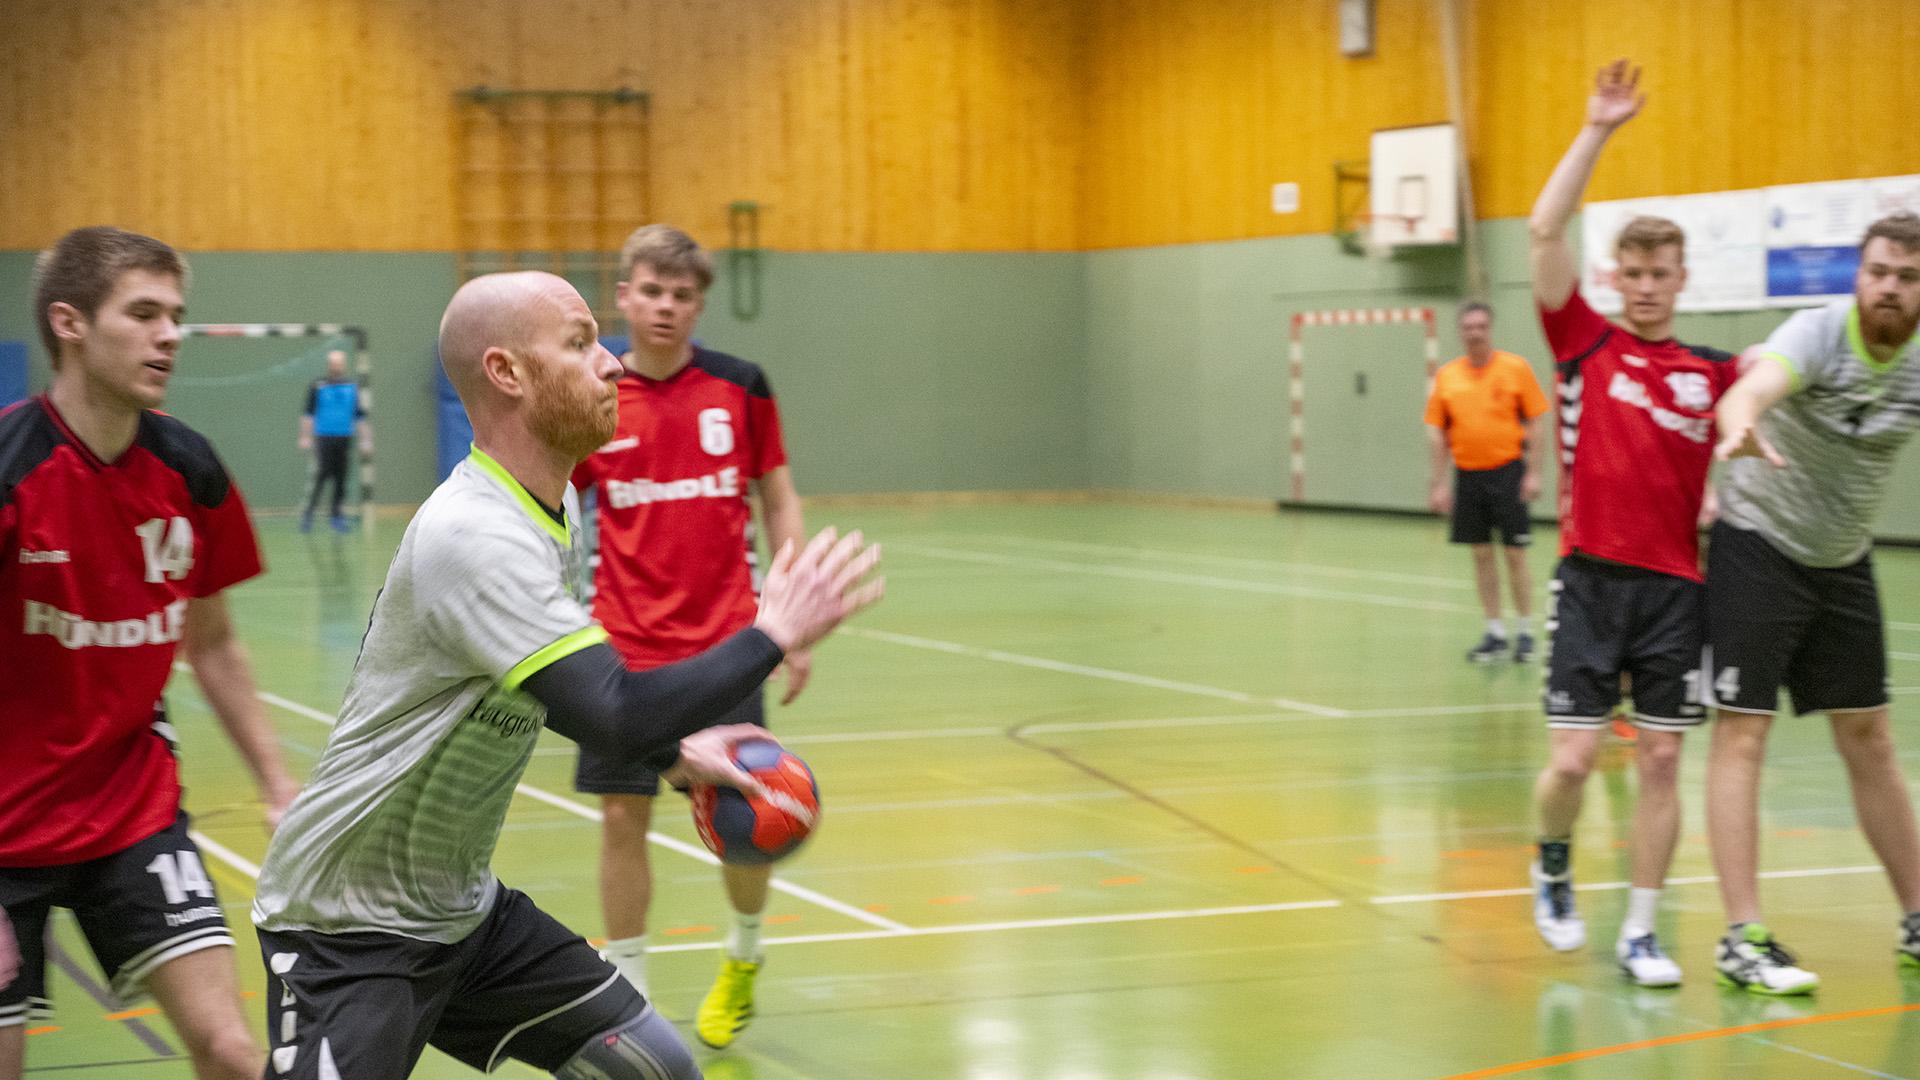 067Slider_Herren2_tsg_leutkirch_handball